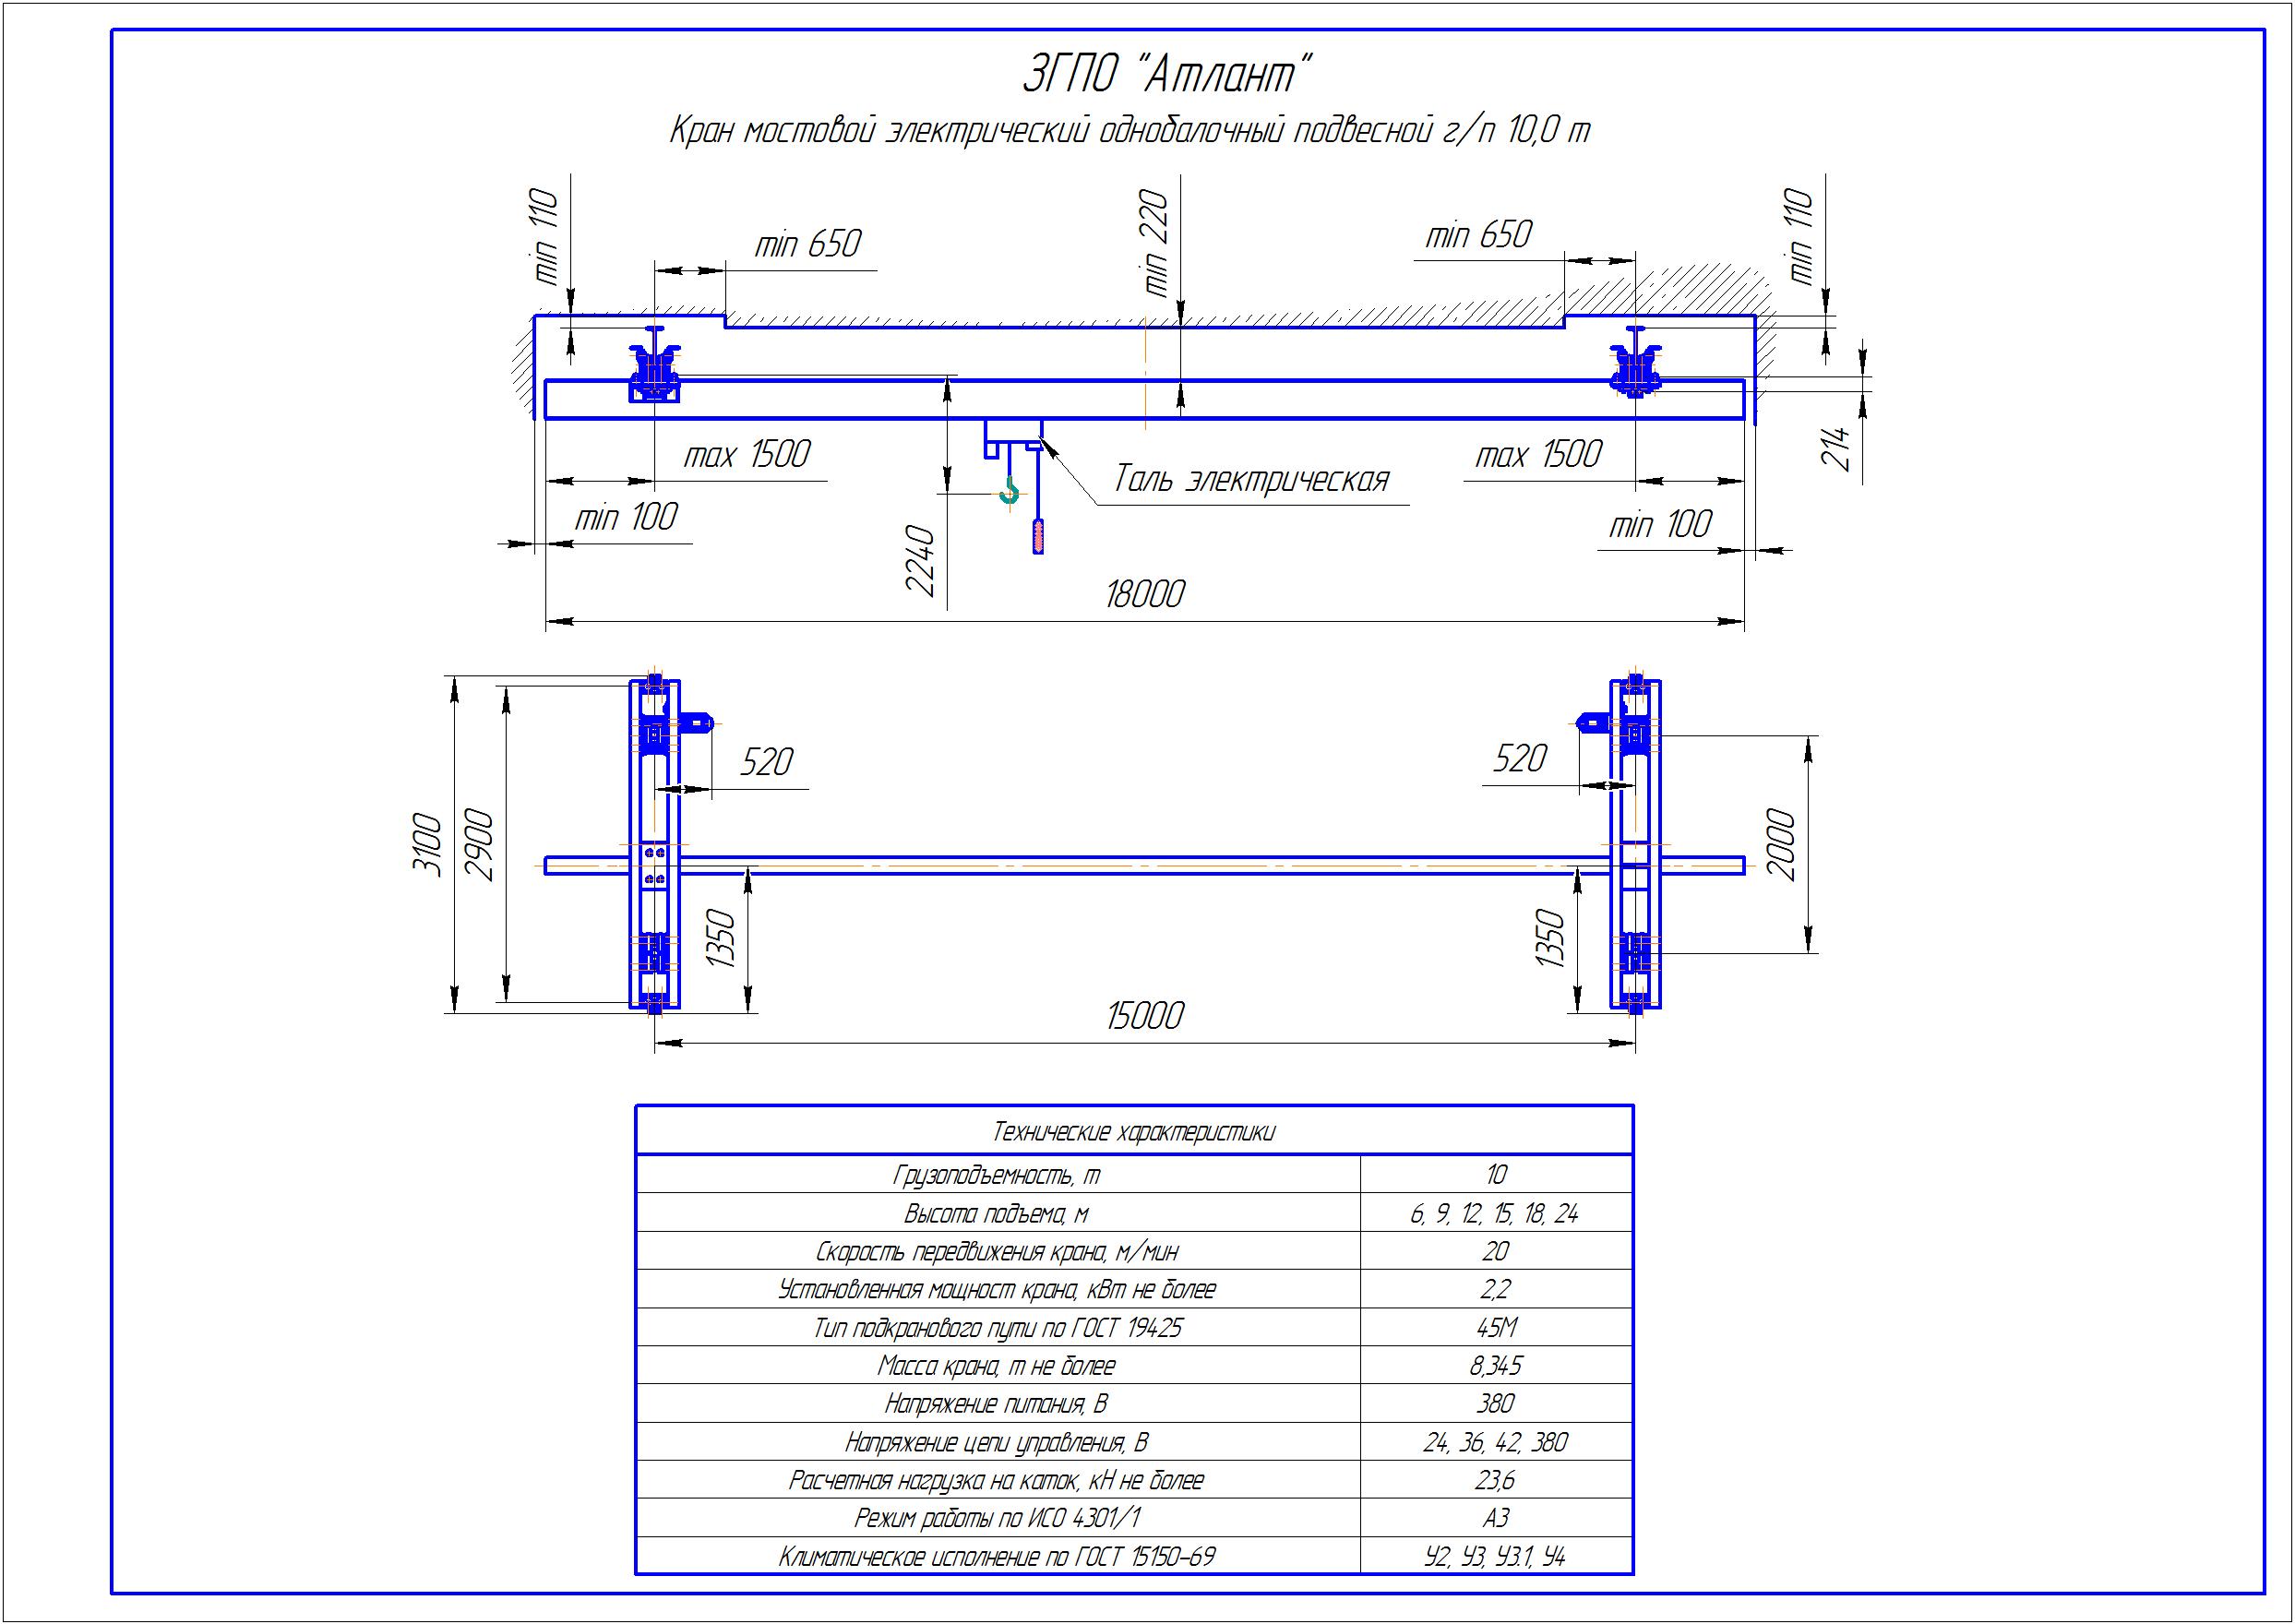 KBP 7 5 - Подвесная кран балка